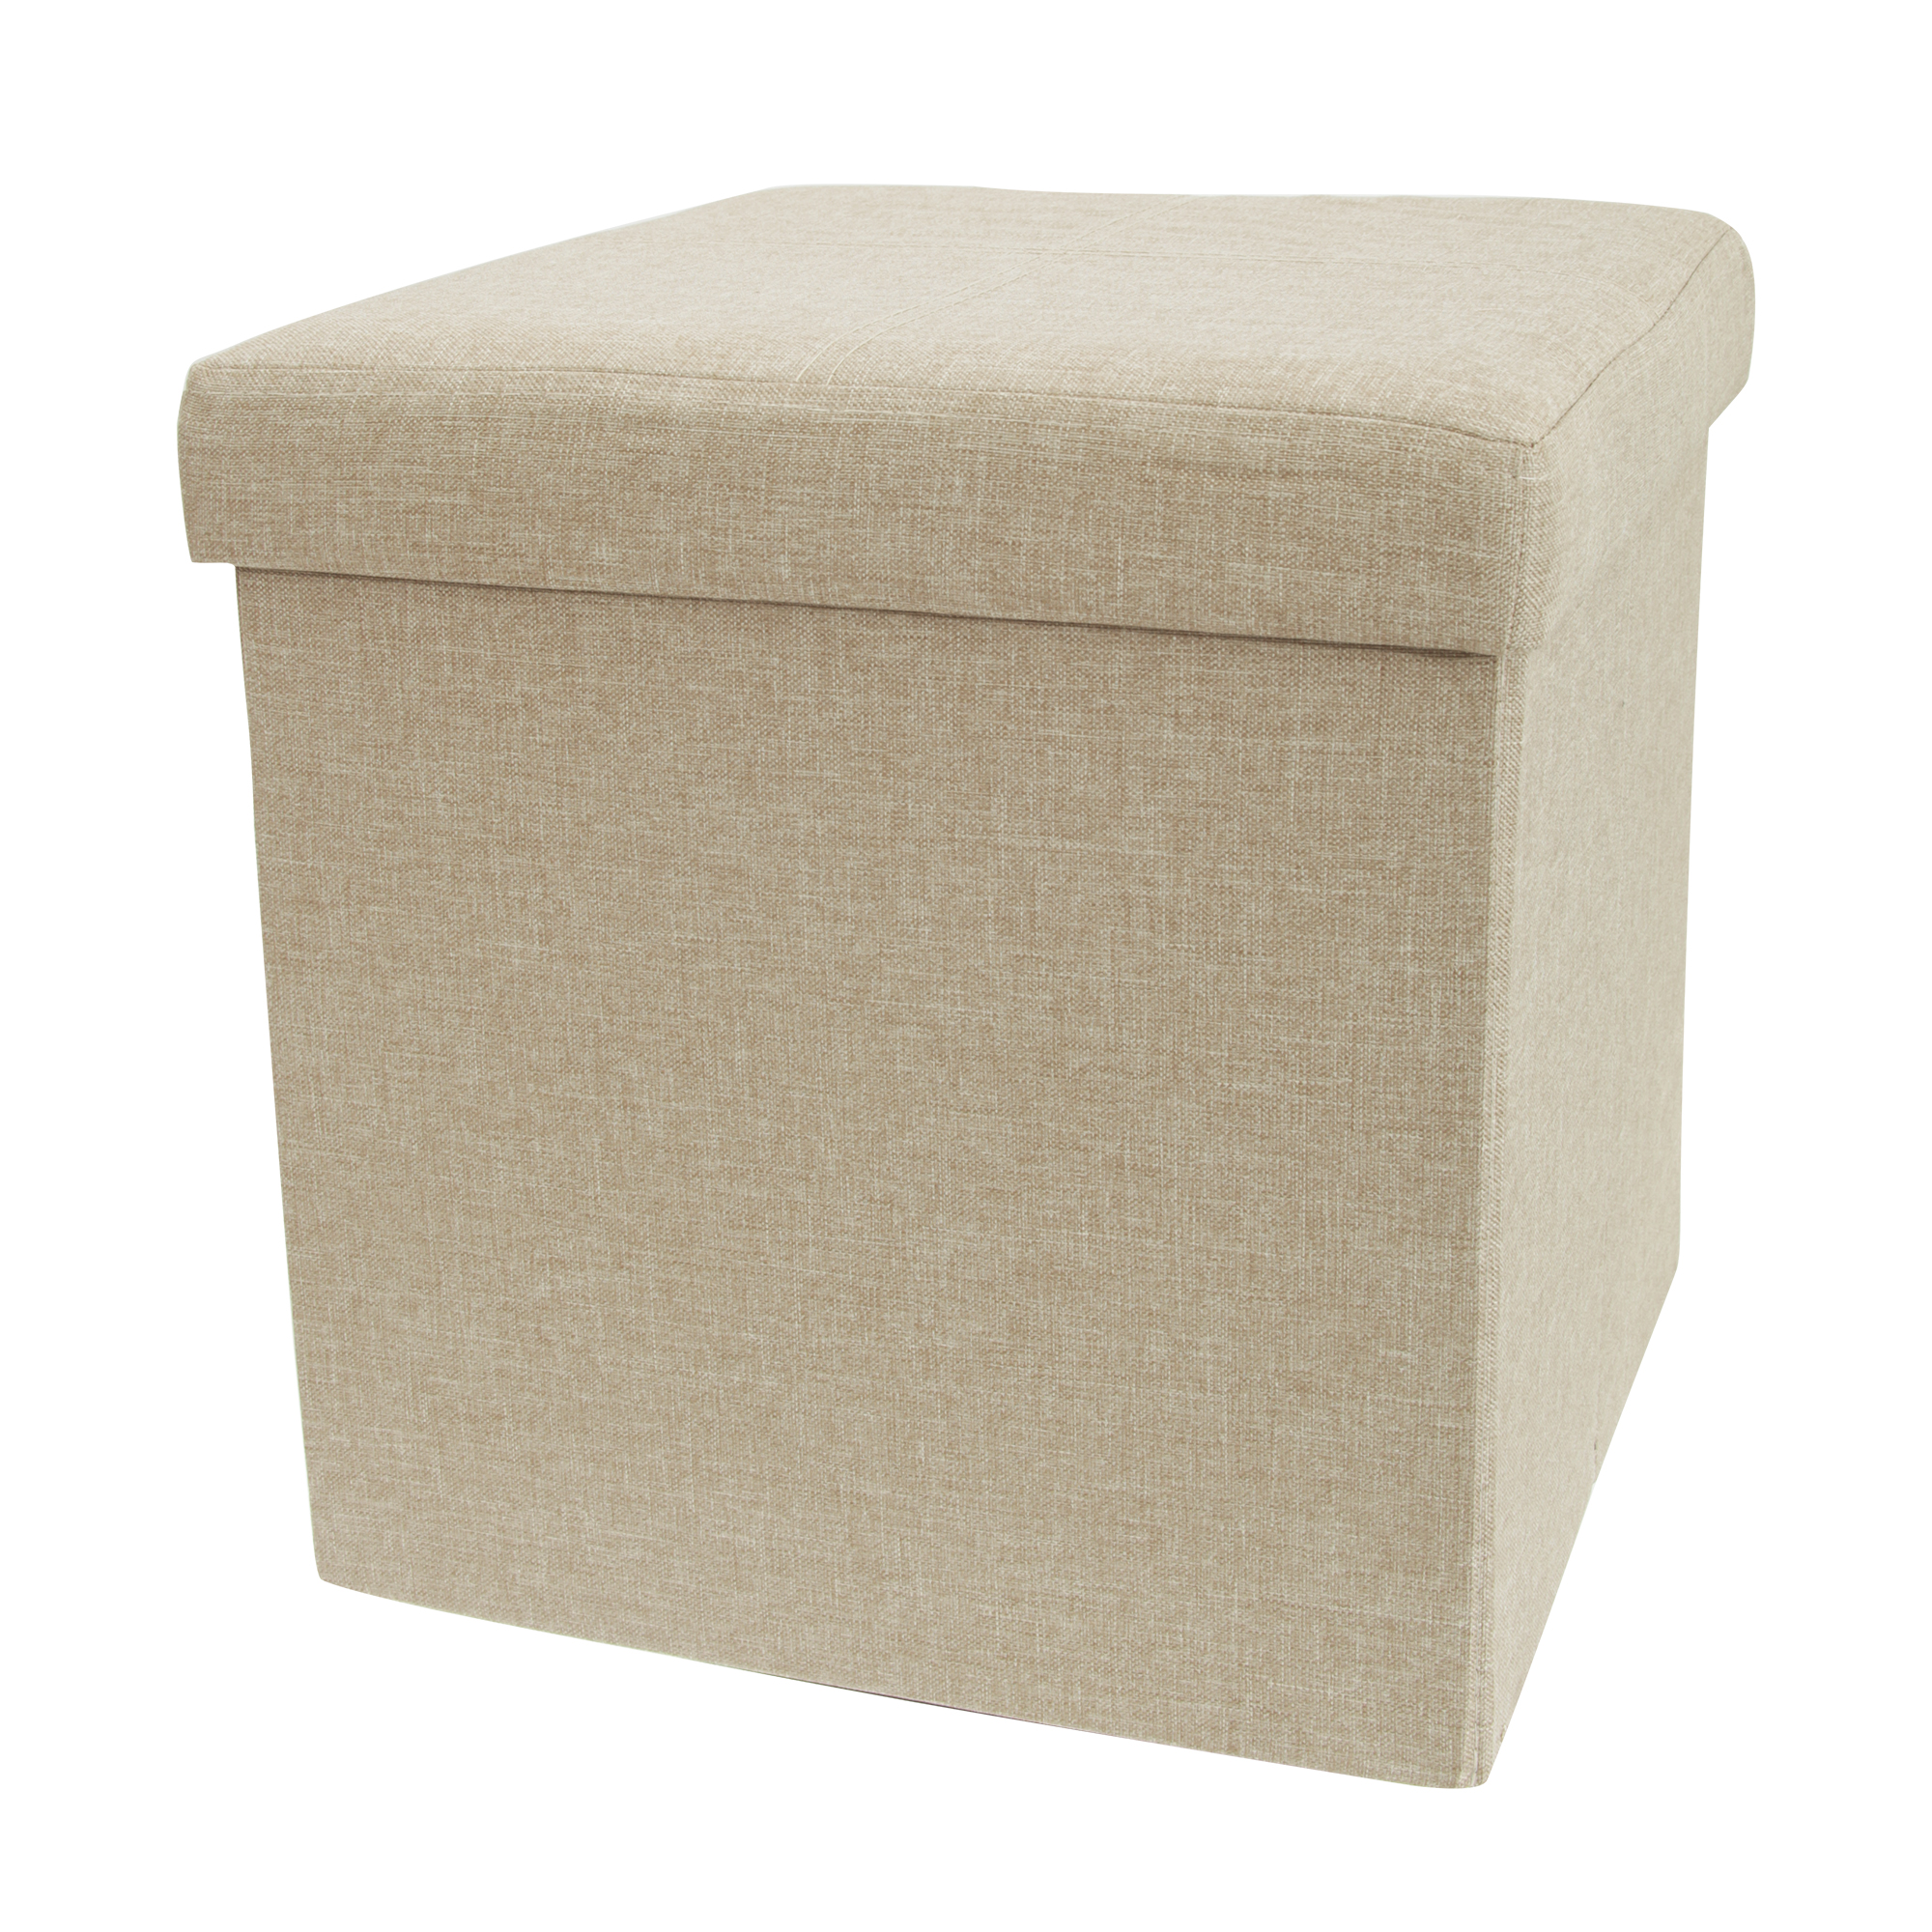 multifunctional linen folding square storage box ottoman